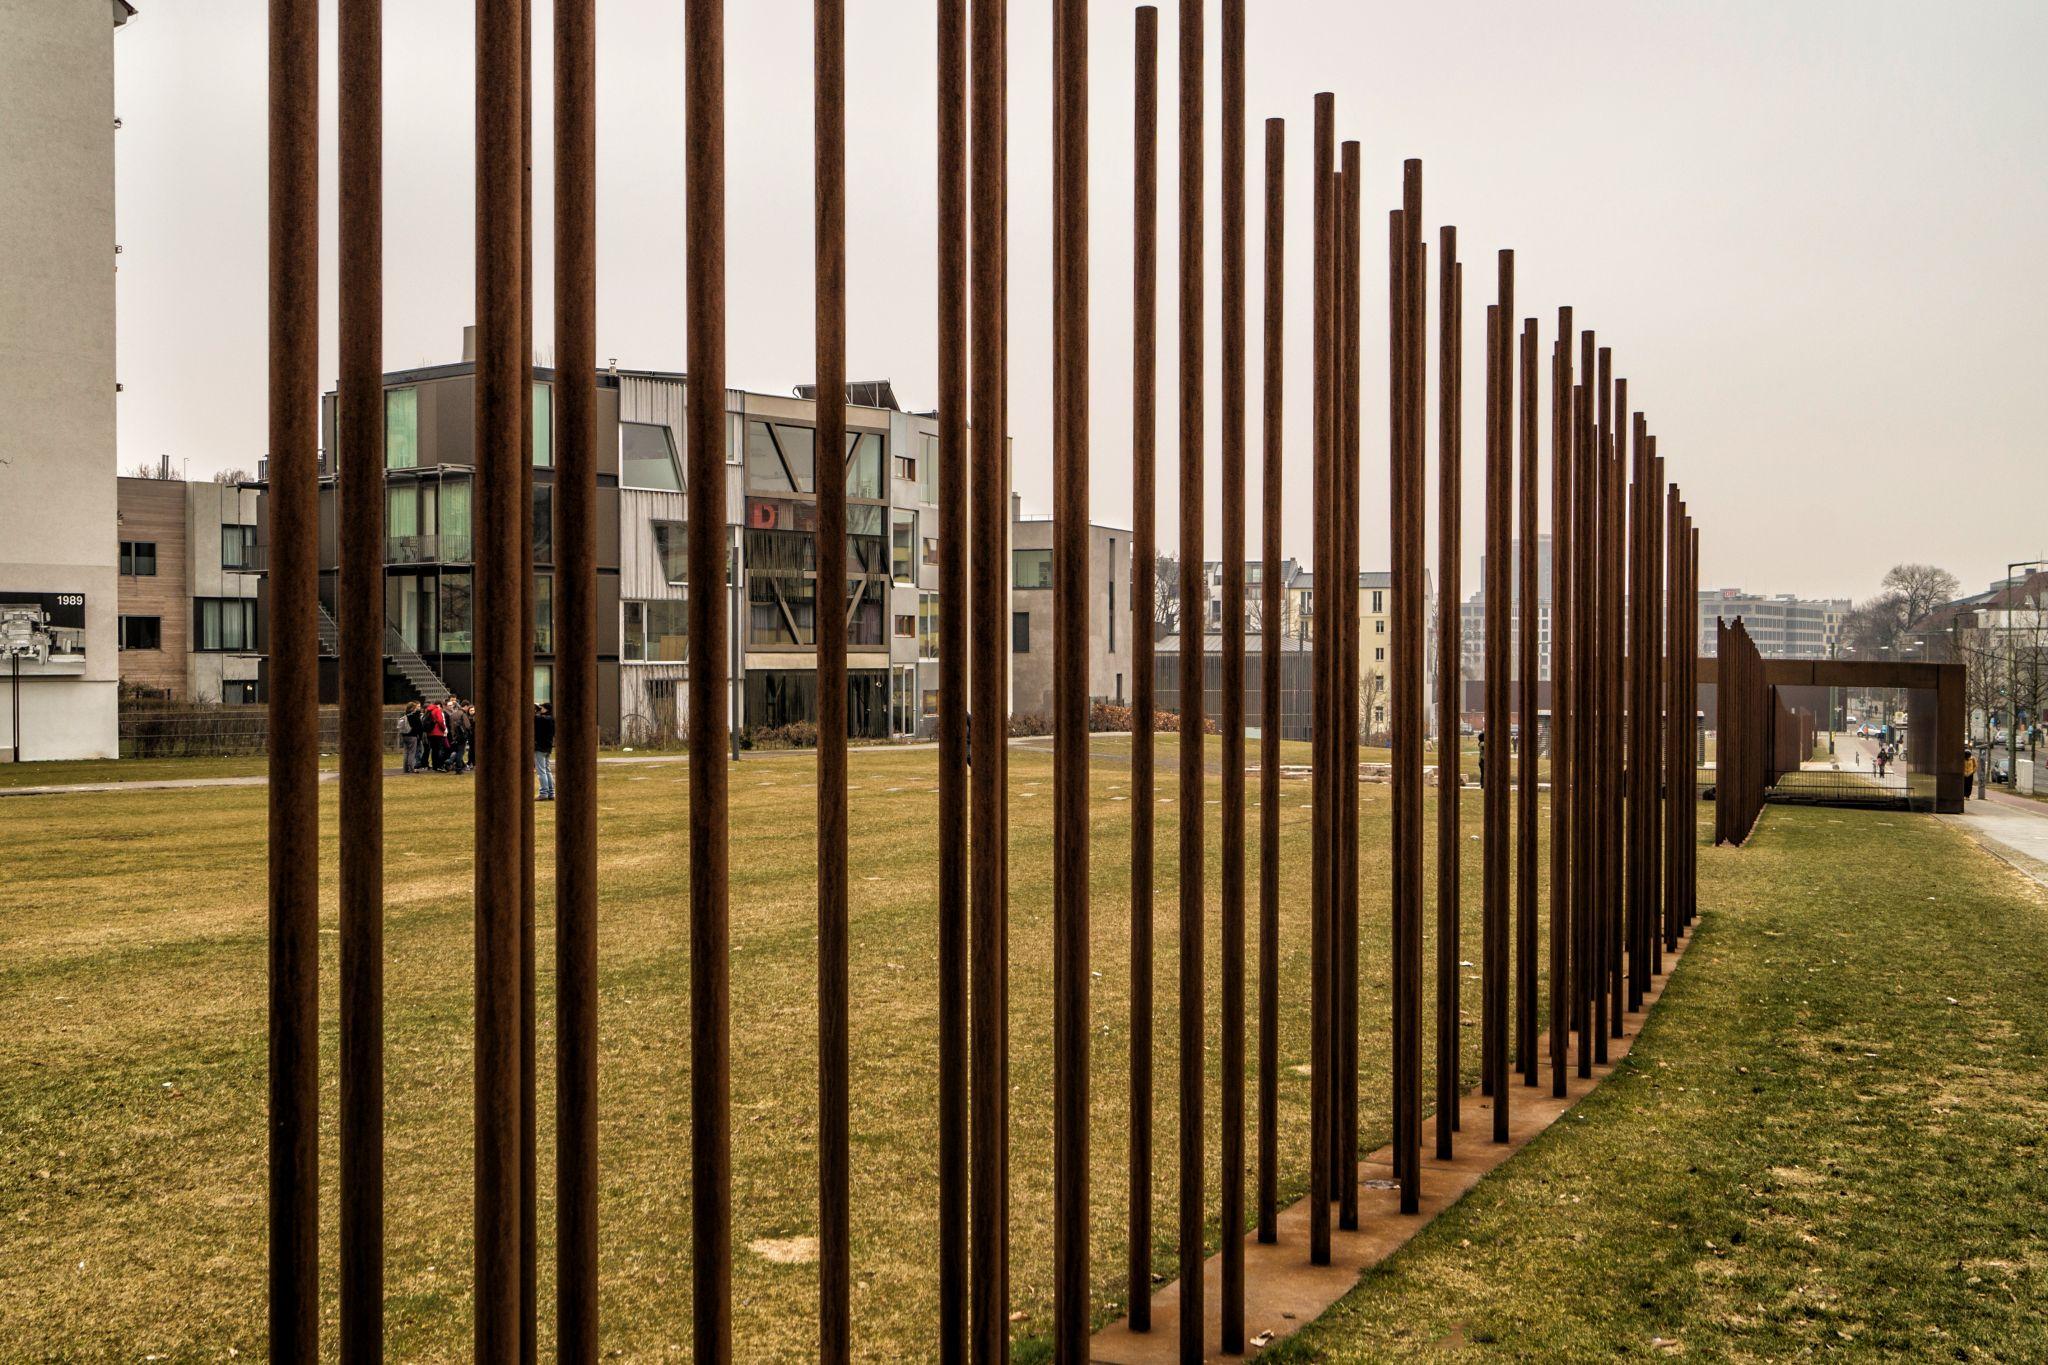 Gedenkstätte Berliner Mauer, Germany